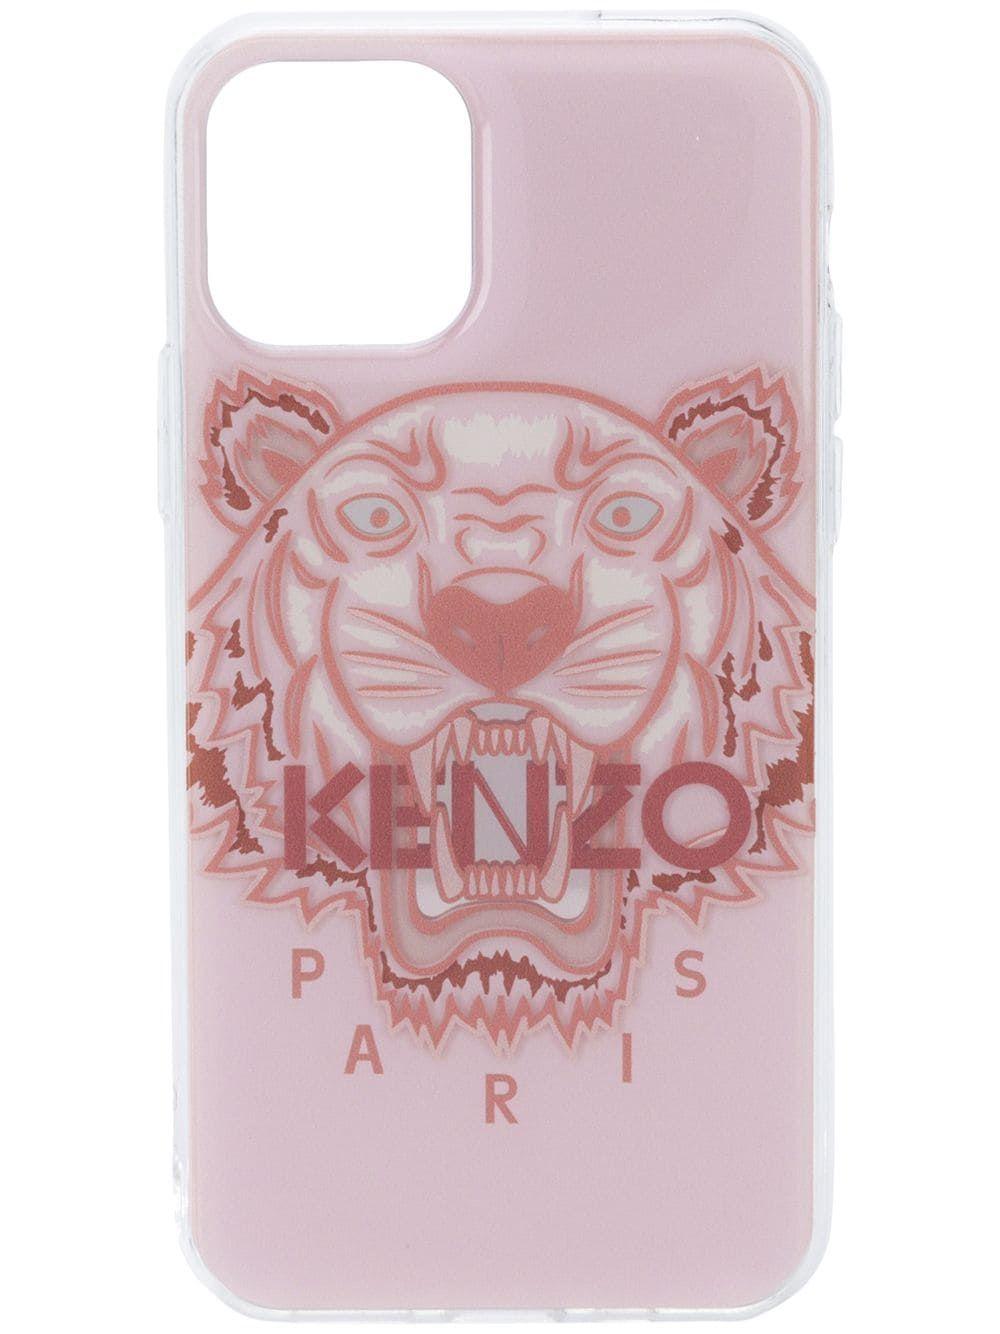 Kenzo Men's Pink Pvc Cover